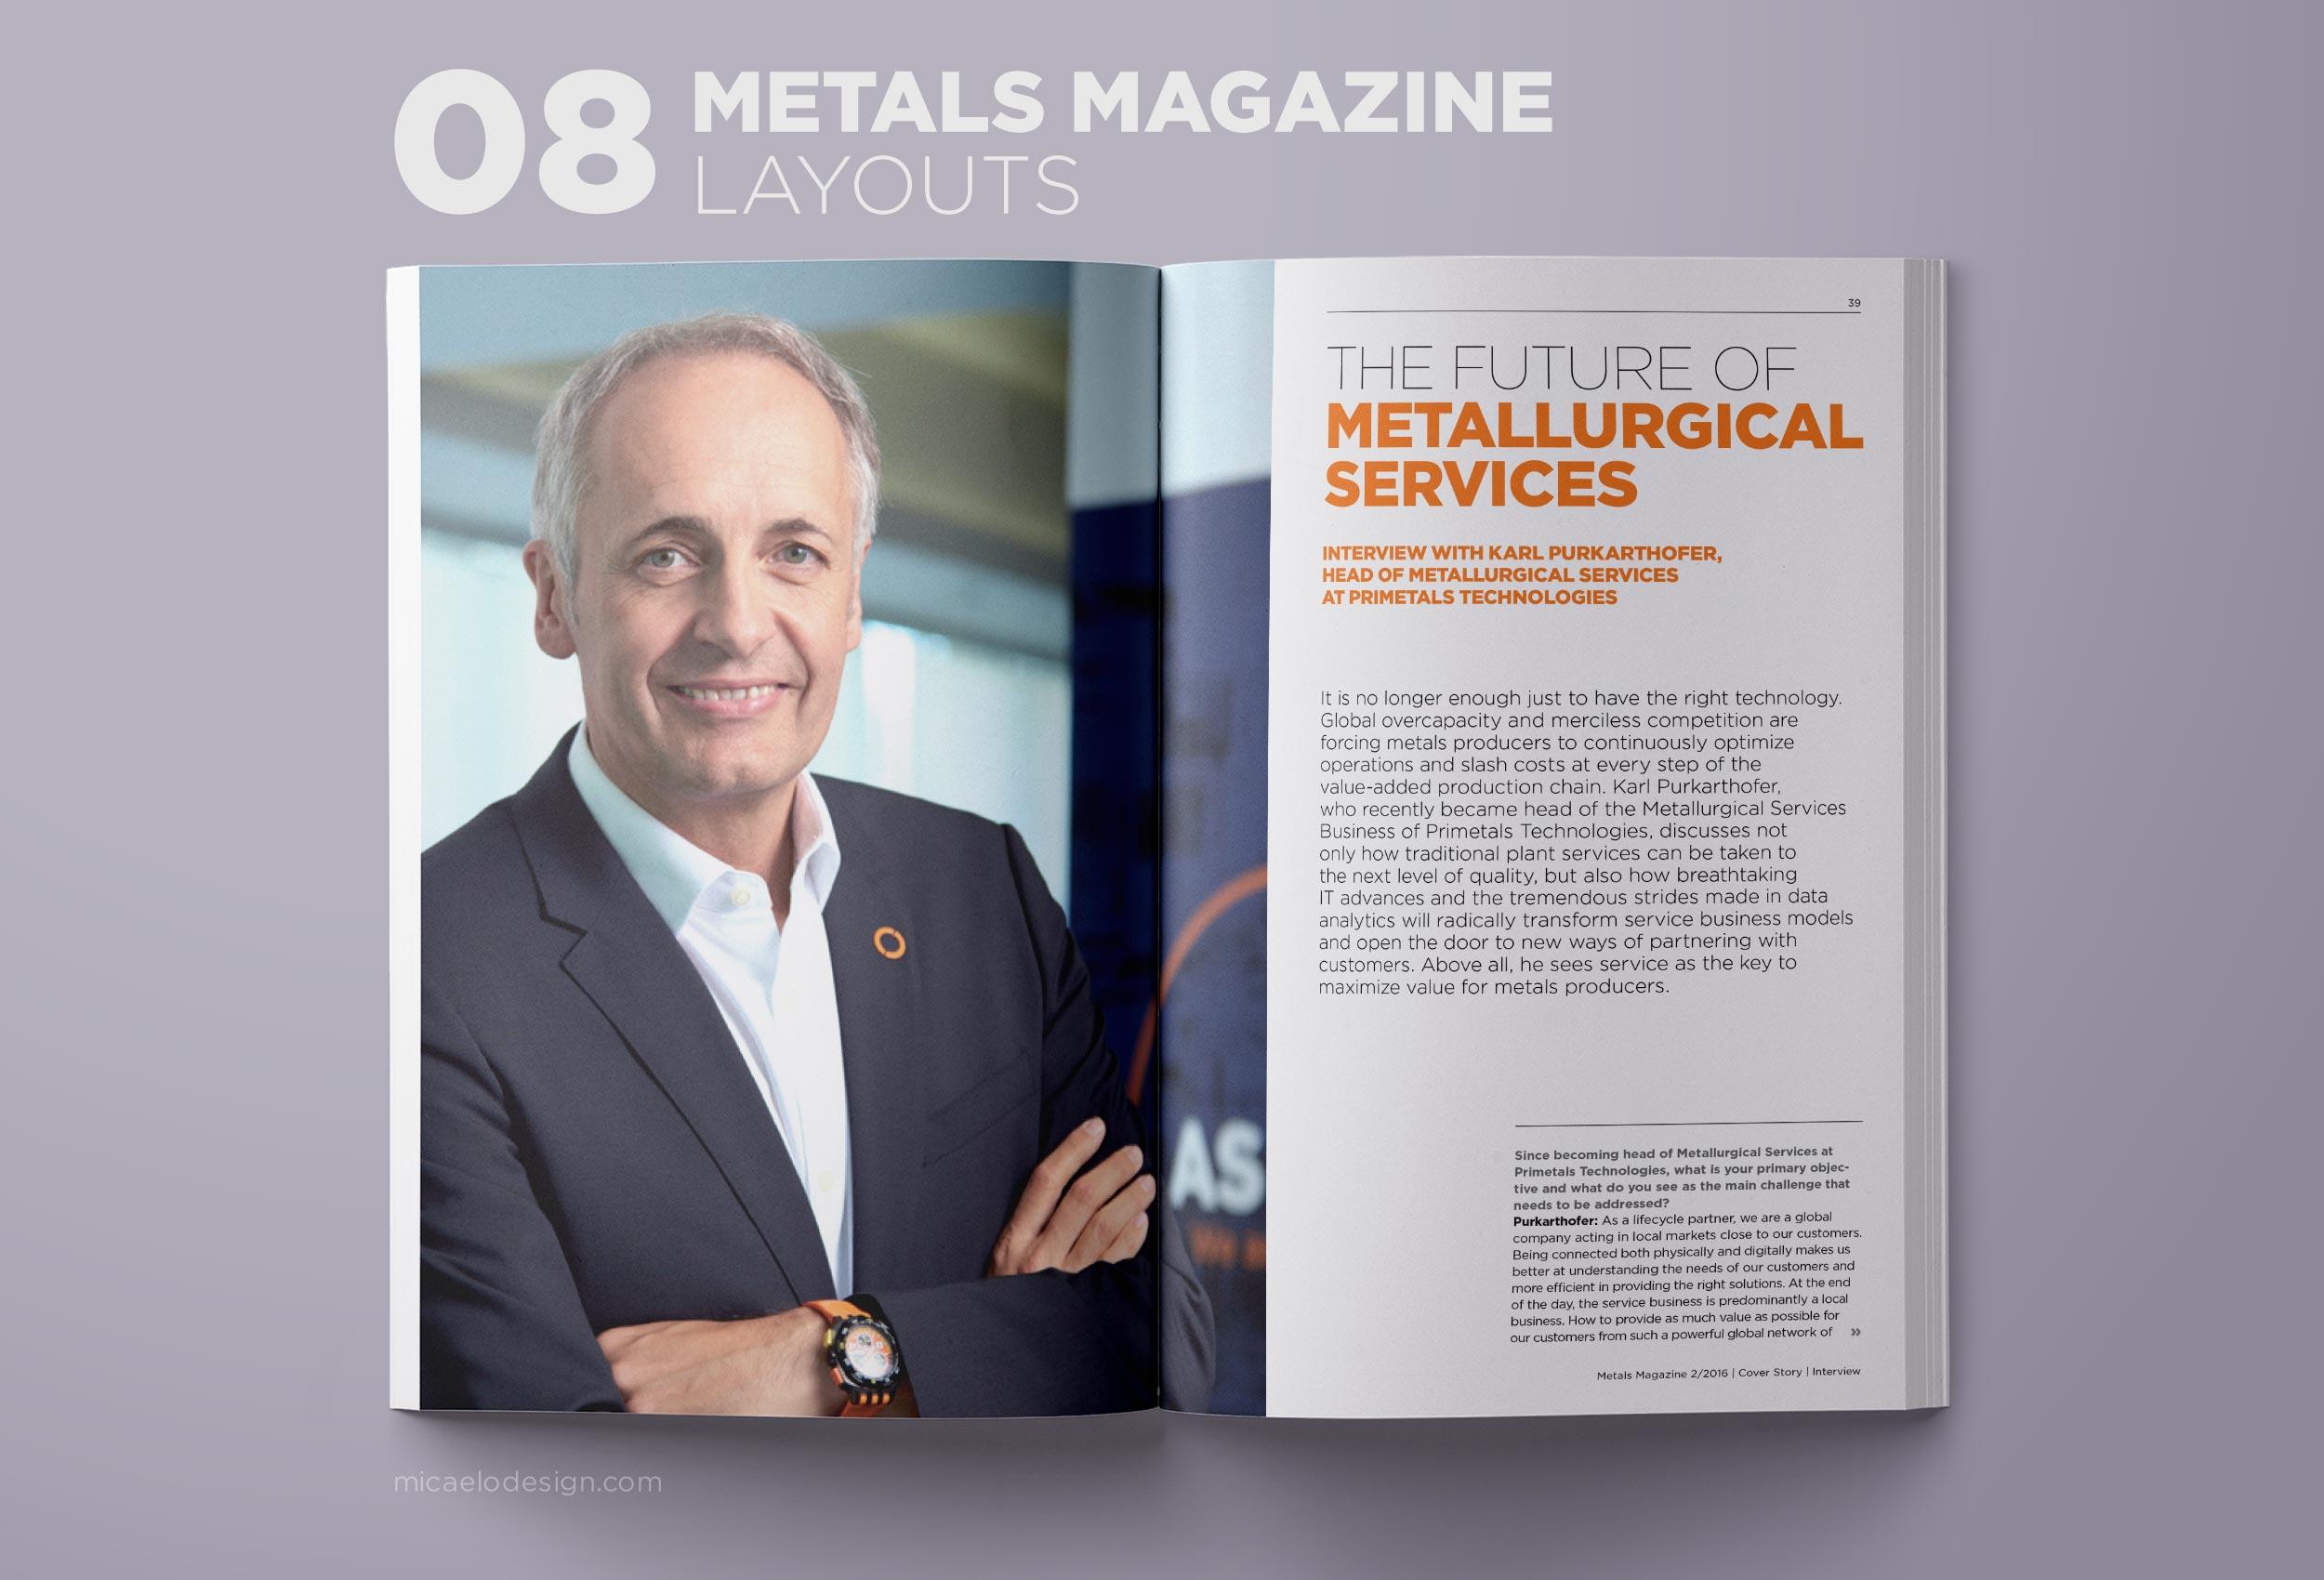 Primetals Metals Magazine layout N08